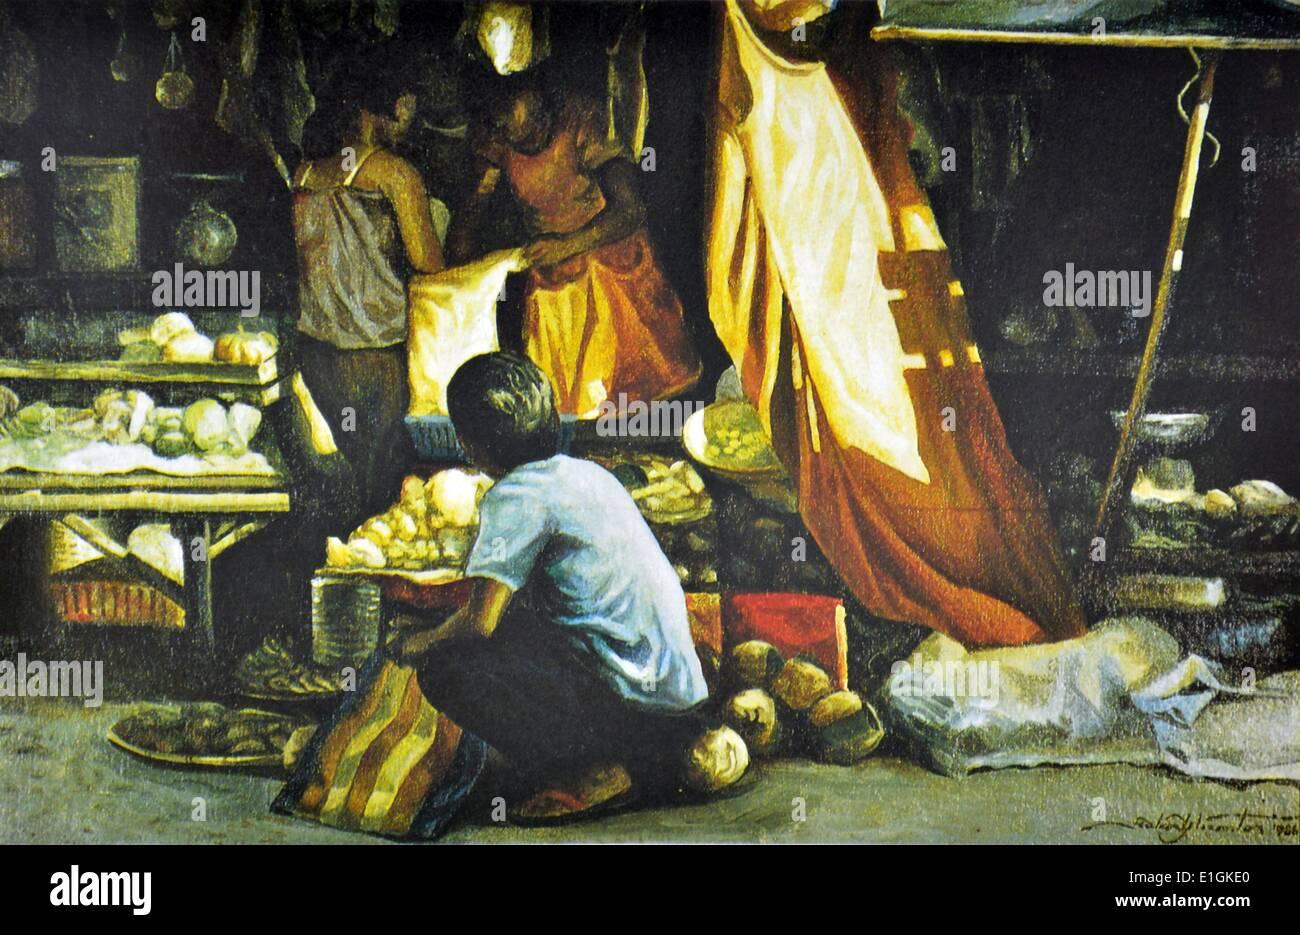 Roland Dellos Santos, Market Scene 1986. Oil on canvas. - Stock Image